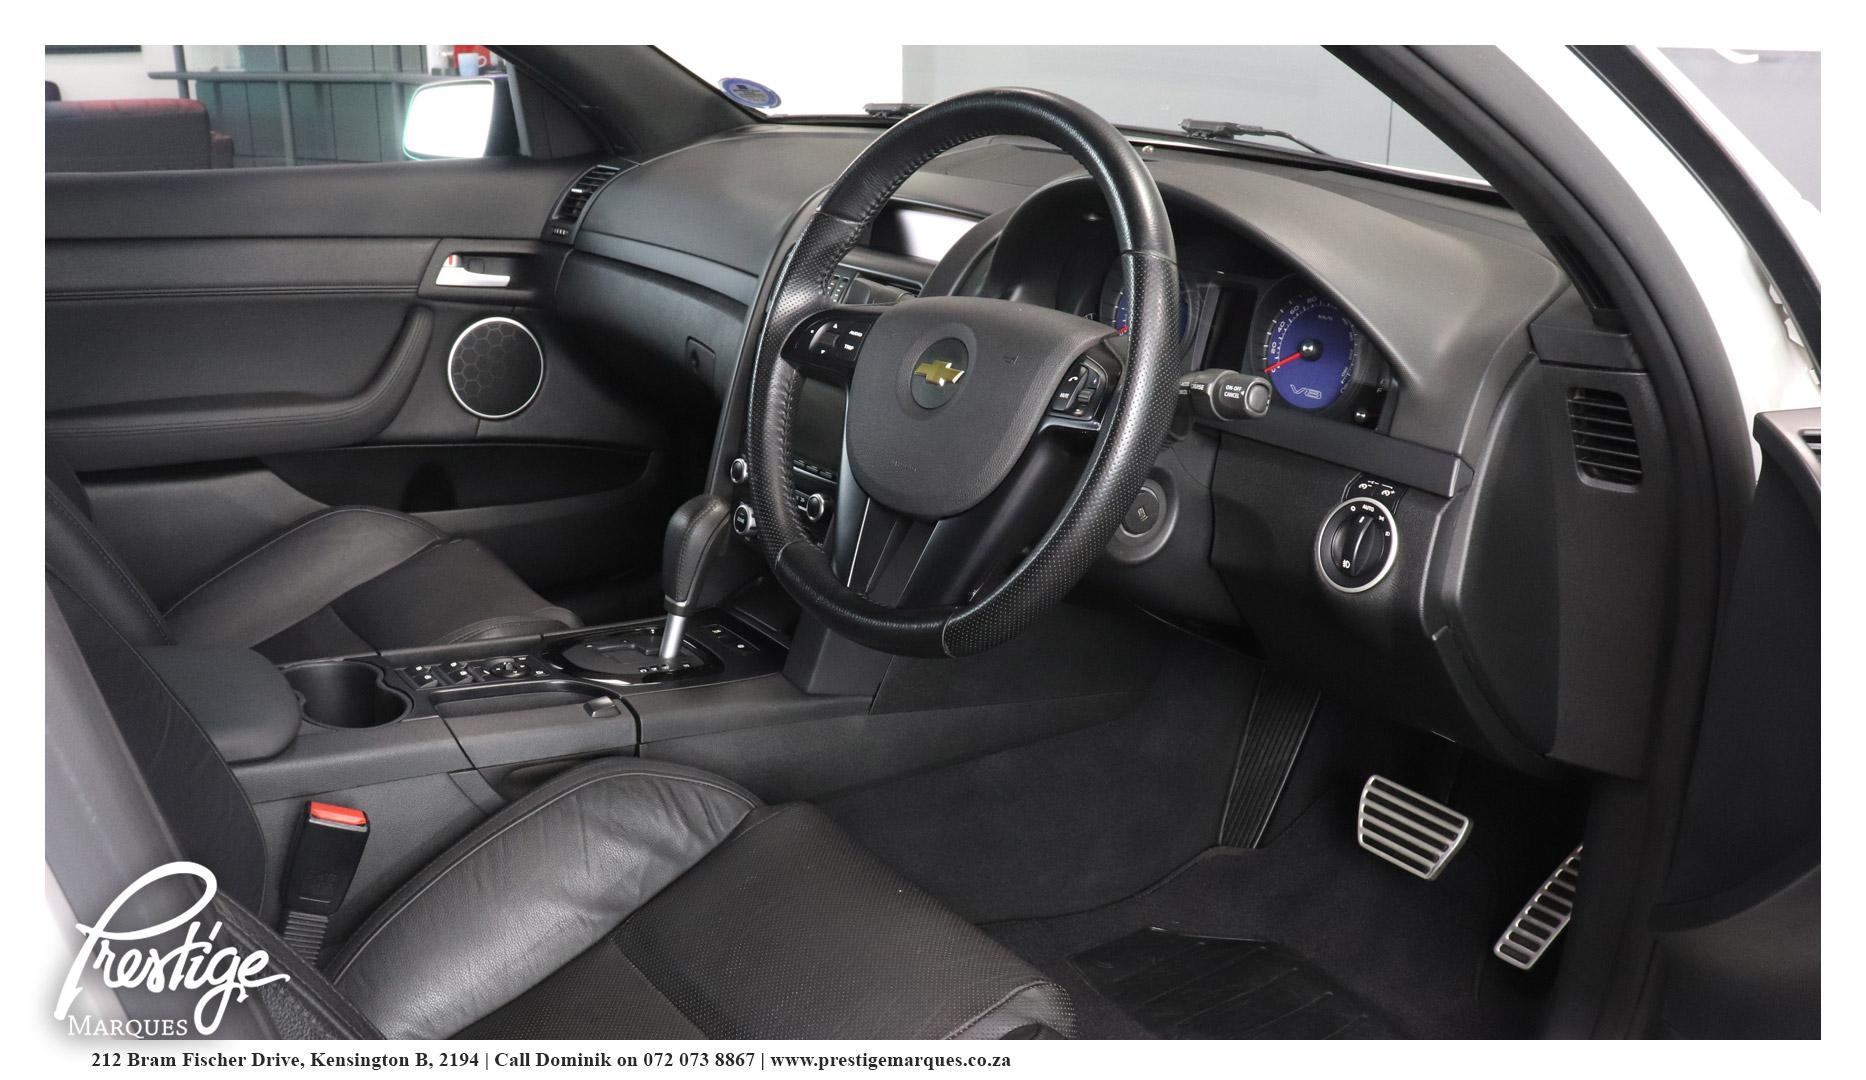 2008-Chevrolet-Lumina-SS-5.4-Manual-Prestige-Marques-Randburg-Sandton-14